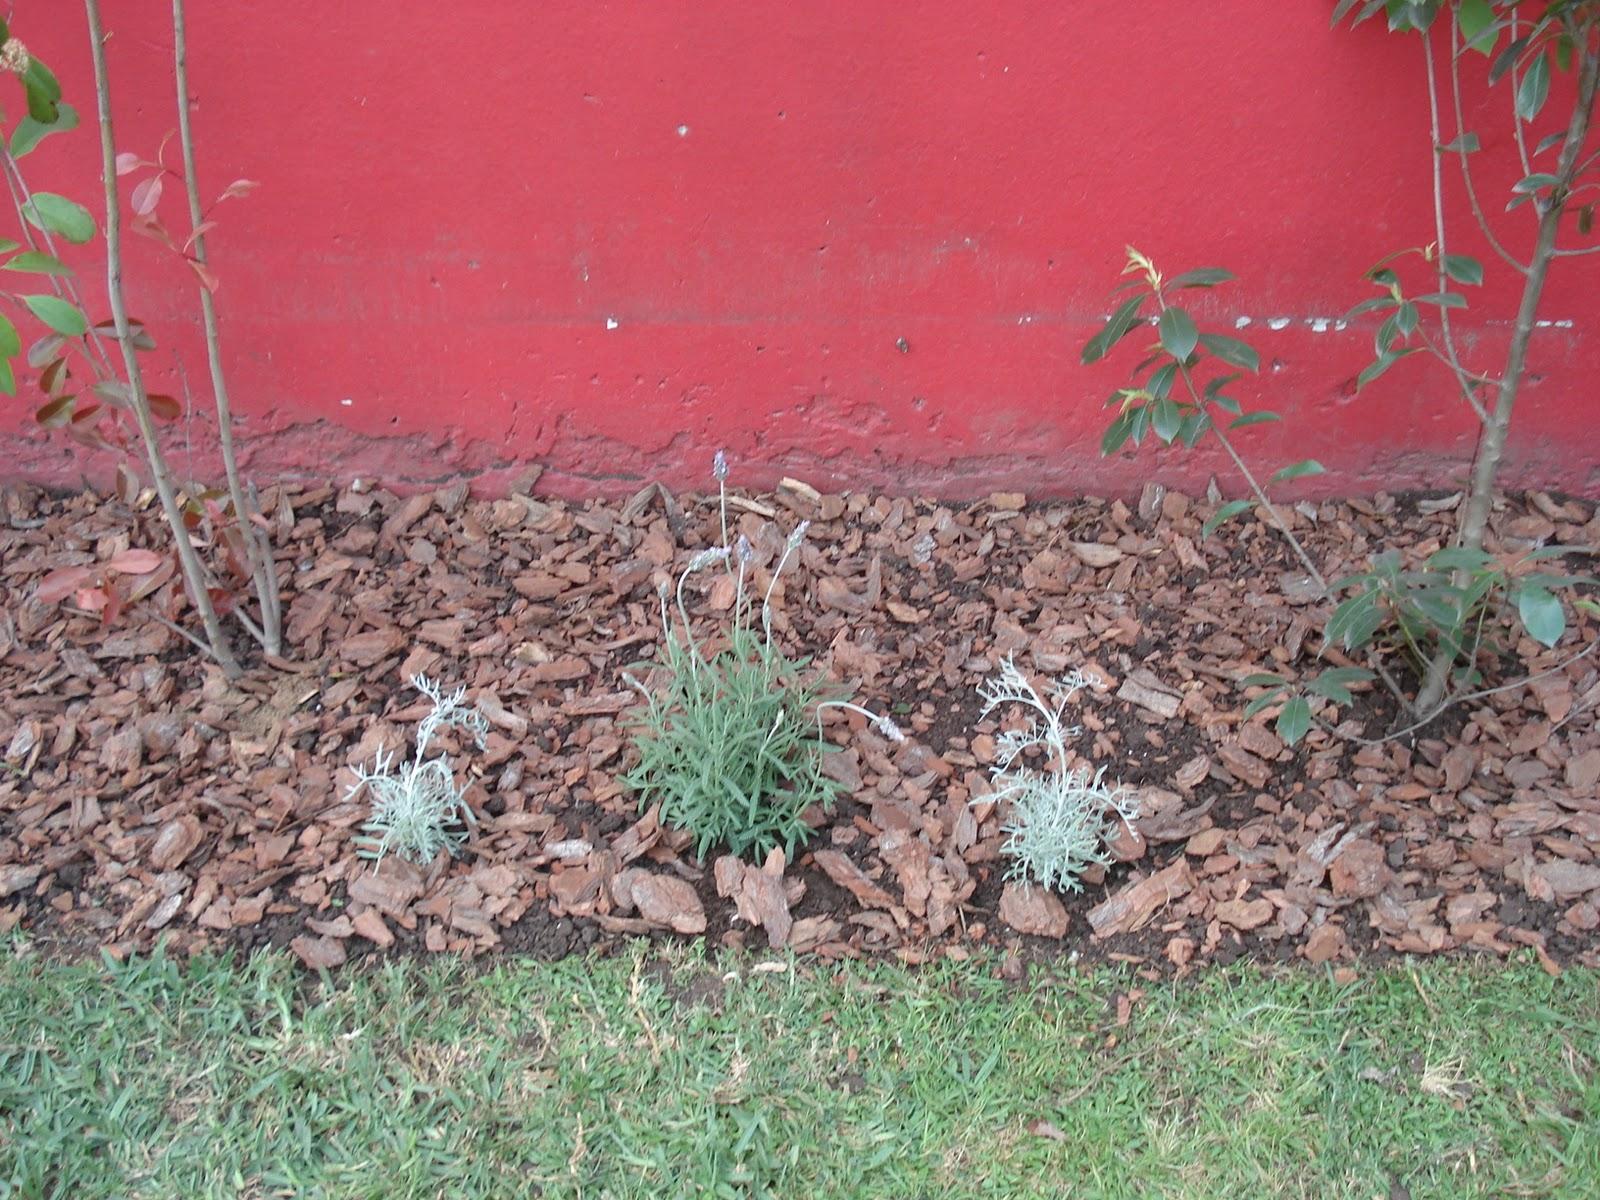 Reverdir jardineria y paisajismo jardin cantero for Pdf jardineria y paisajismo